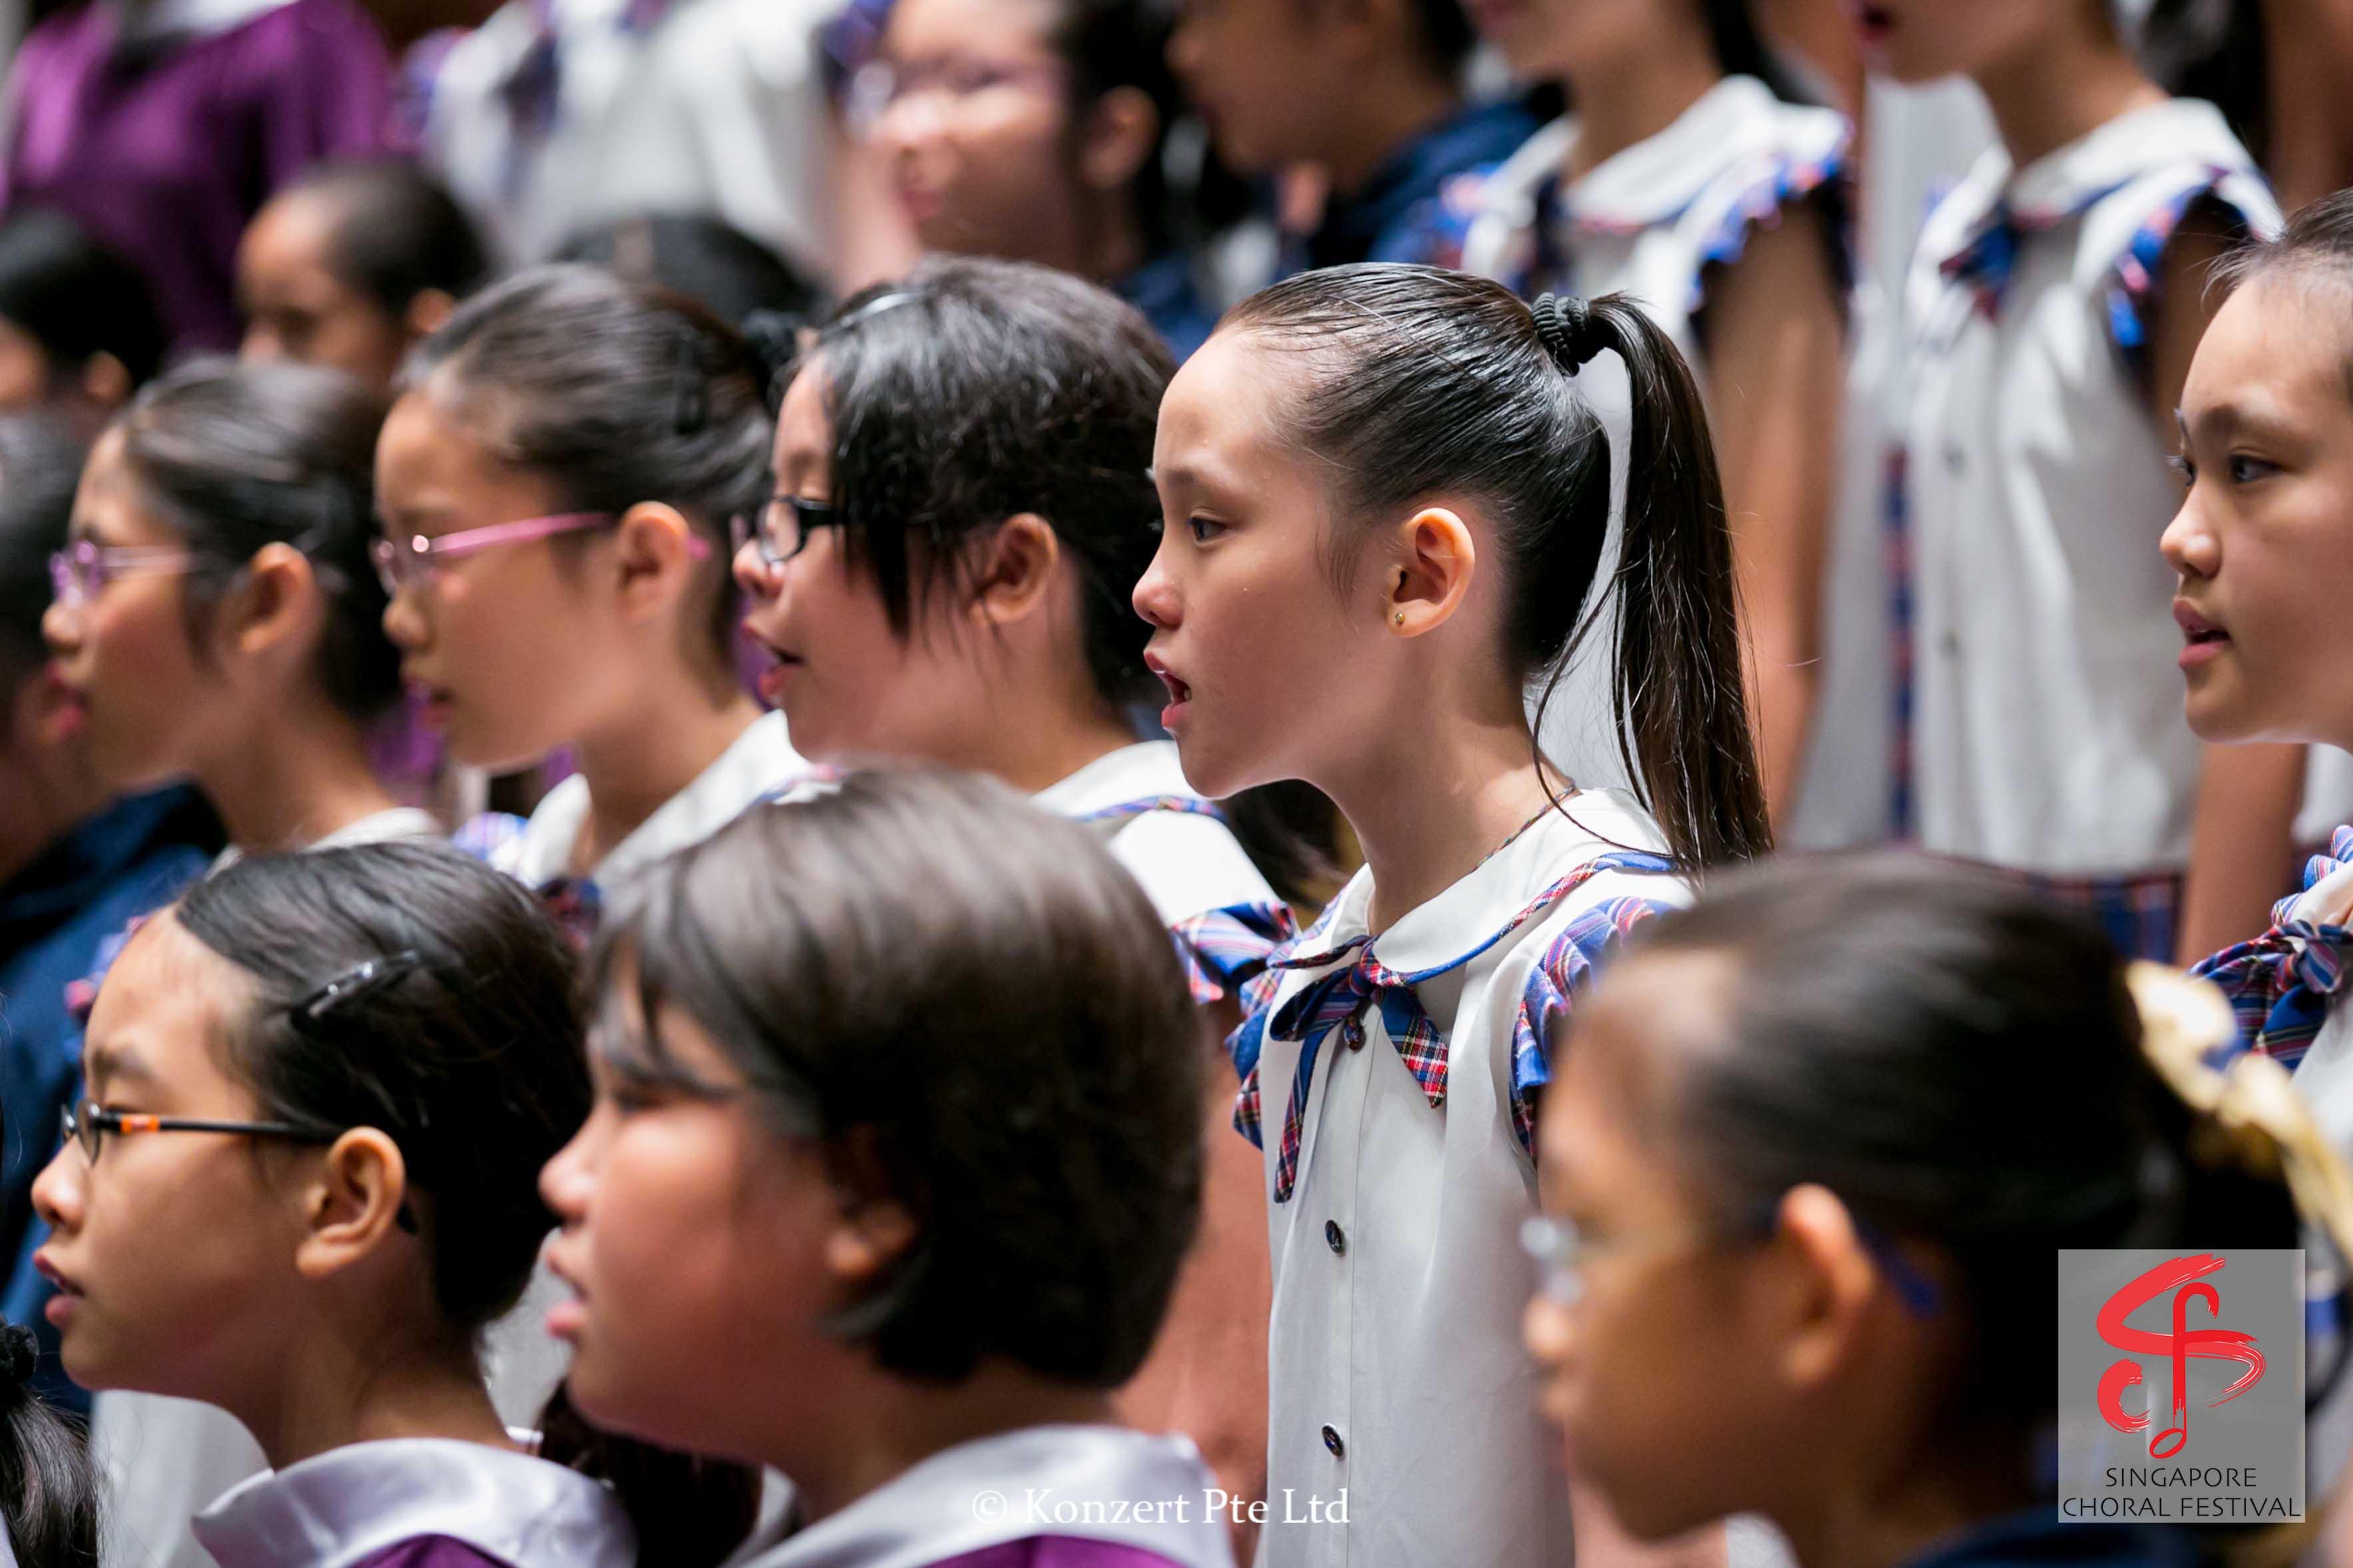 Singapore Choral Festival 8-8-15 (23).jpg